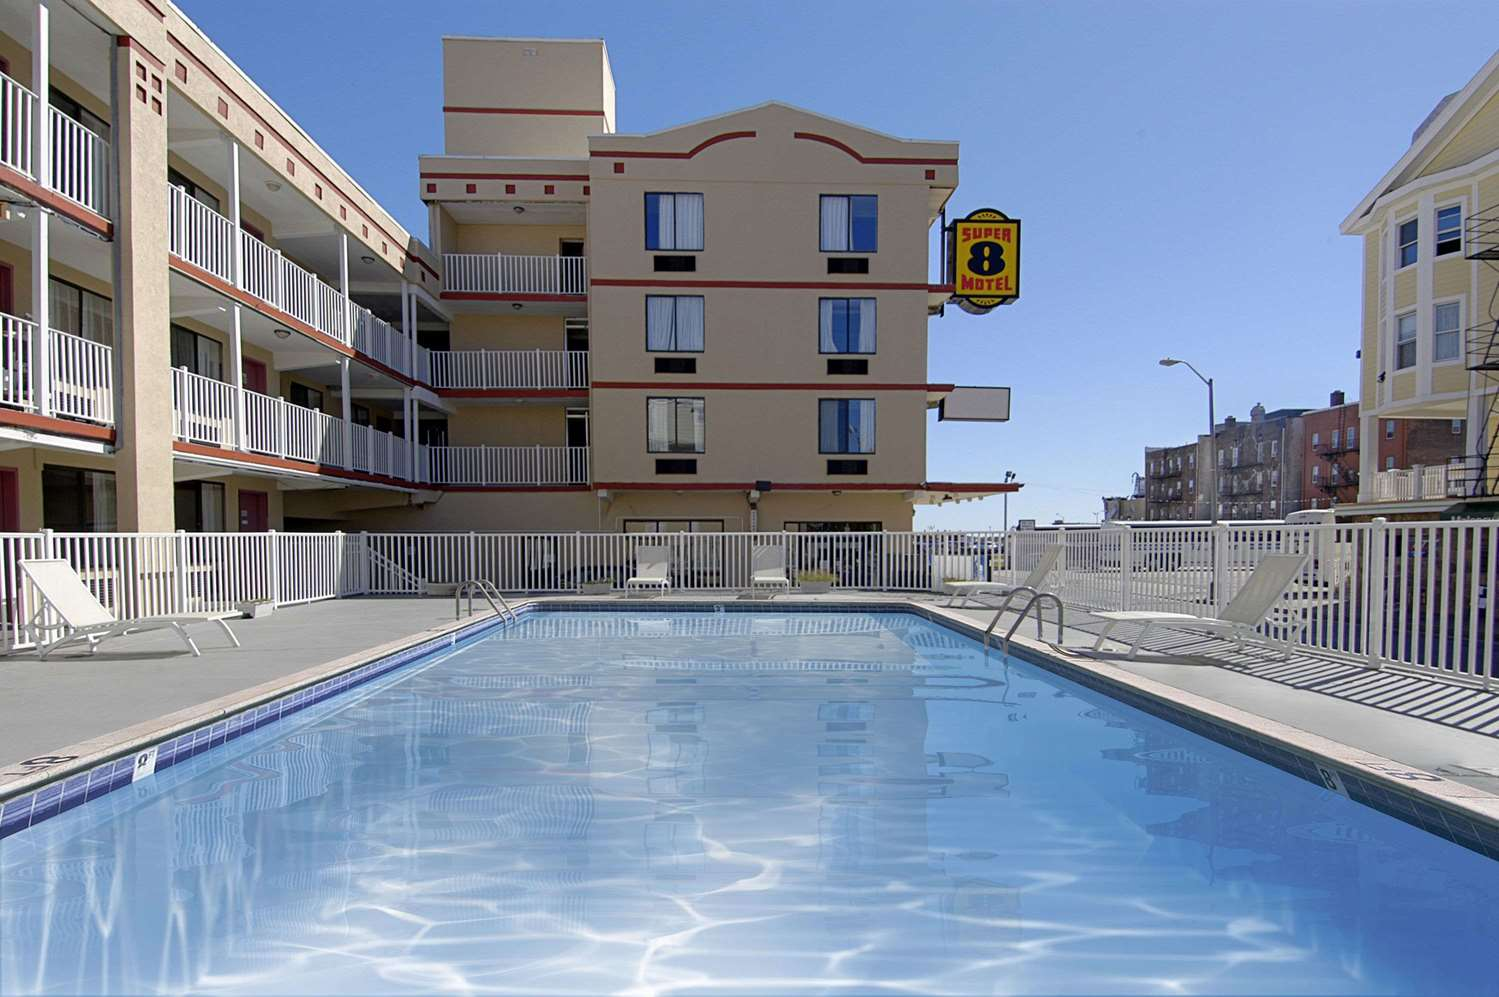 Pool - Super 8 Hotel Atlantic City